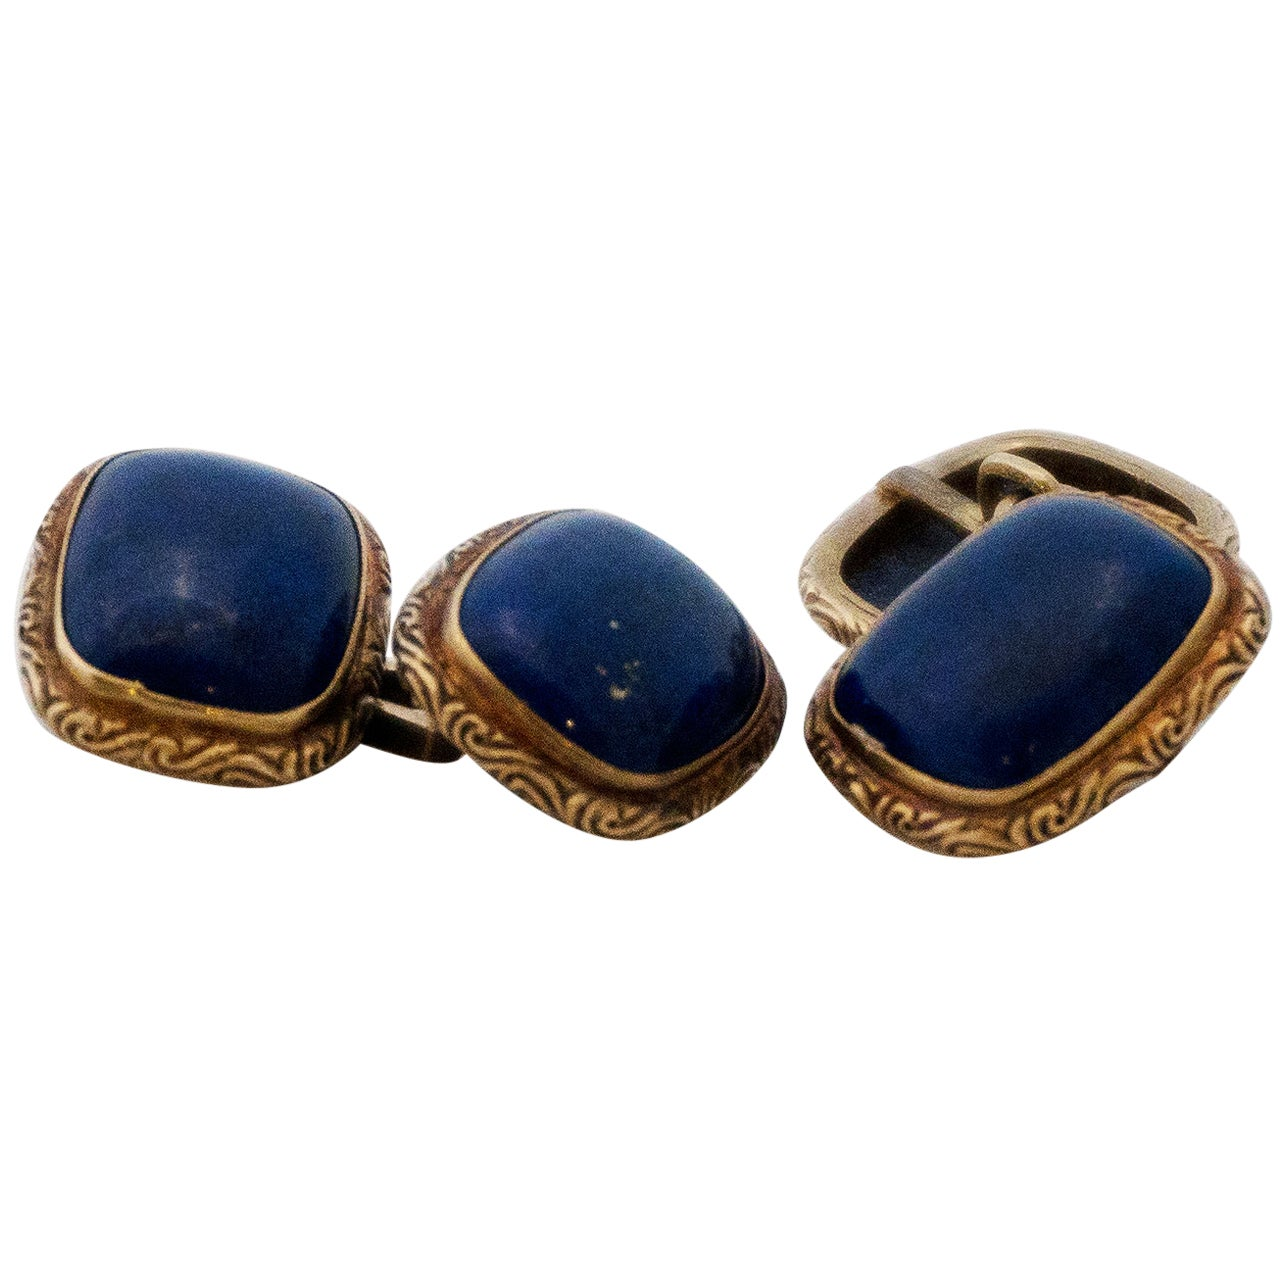 Golden Cufflinks with Lapis Lazuli